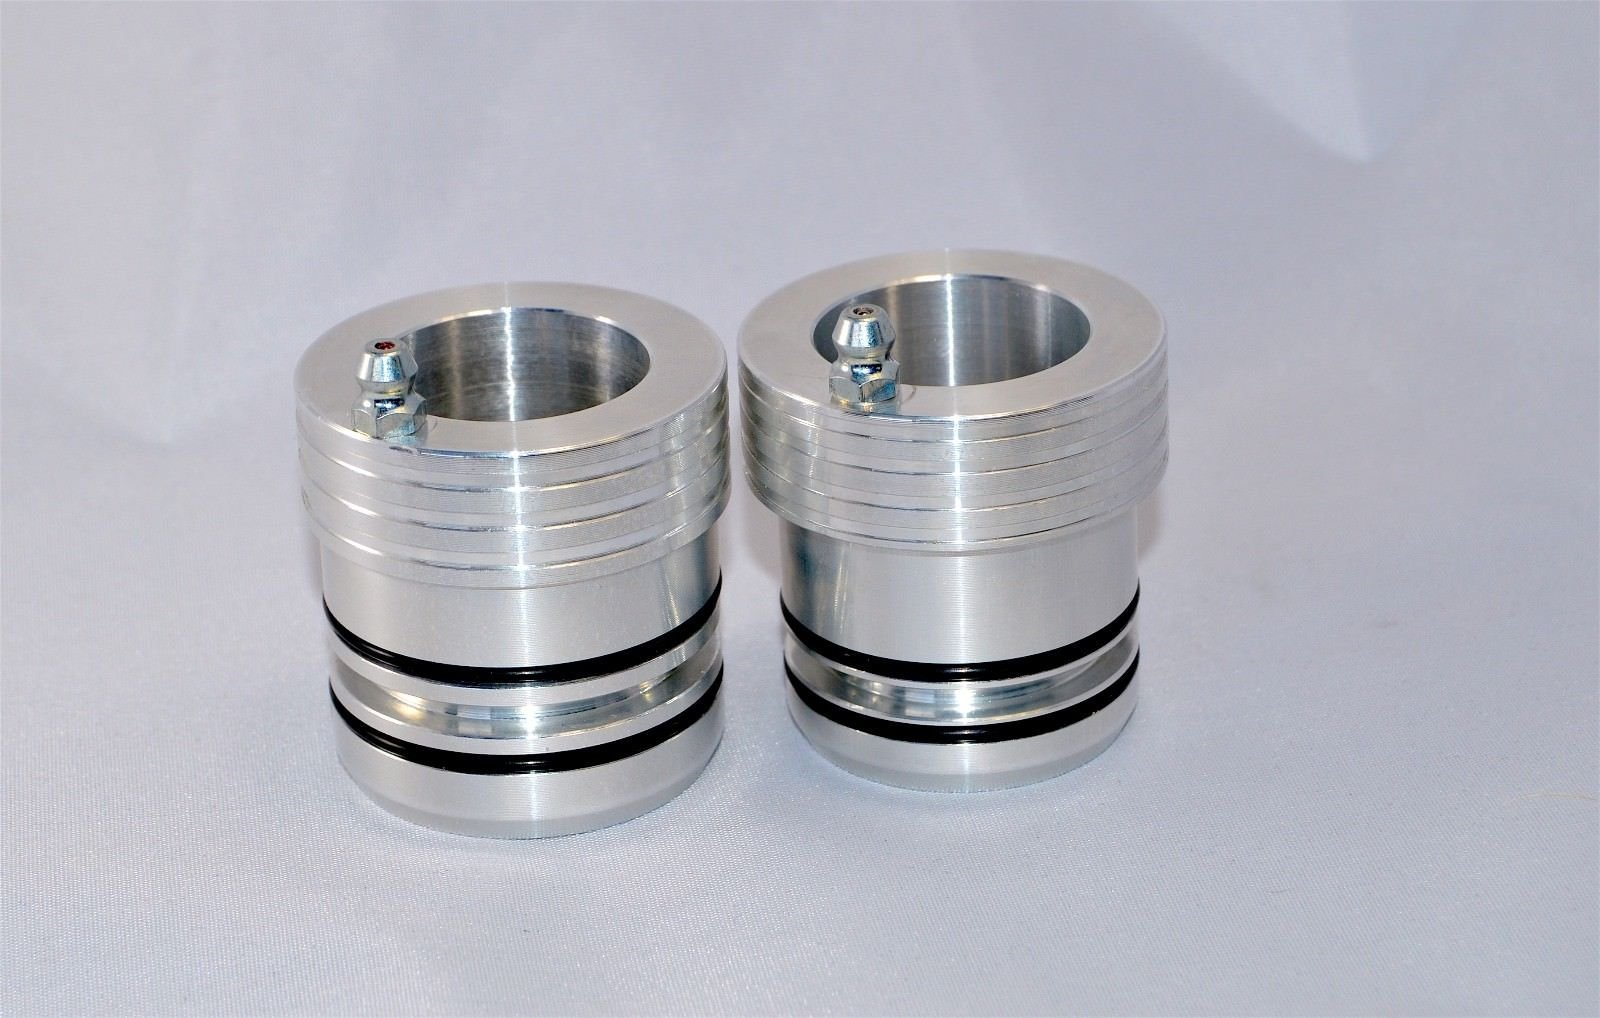 Polaris 40mm & 44mm Wheel Bearing Greaser Tools